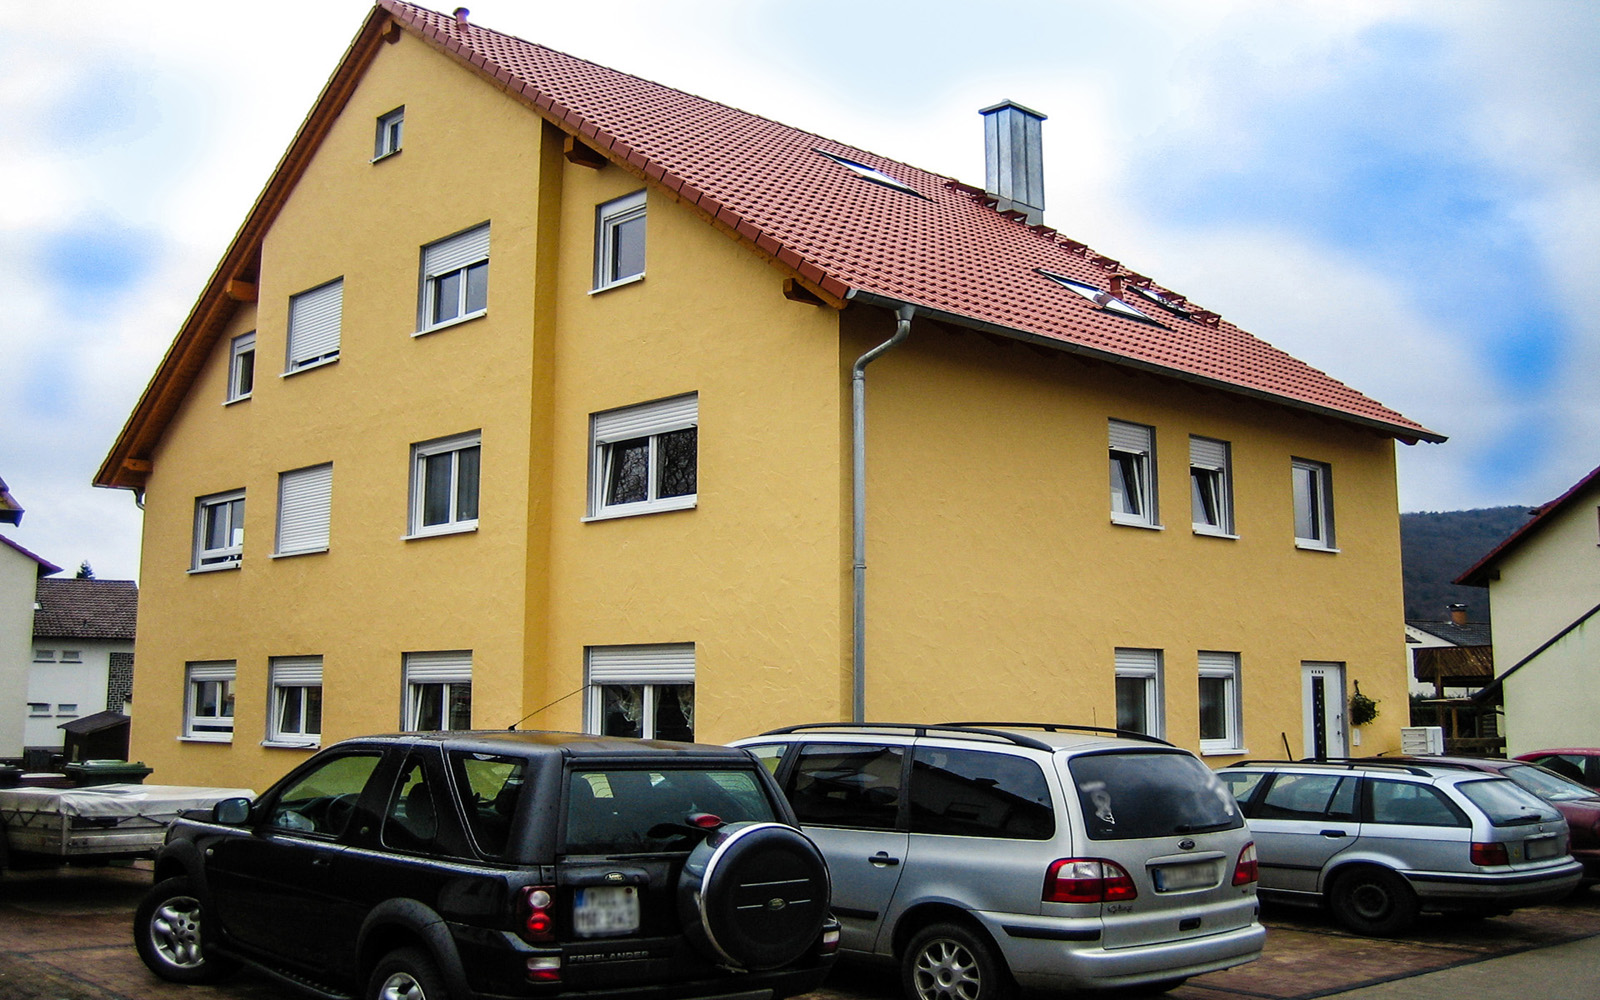 2004-Obernburg-Rehm